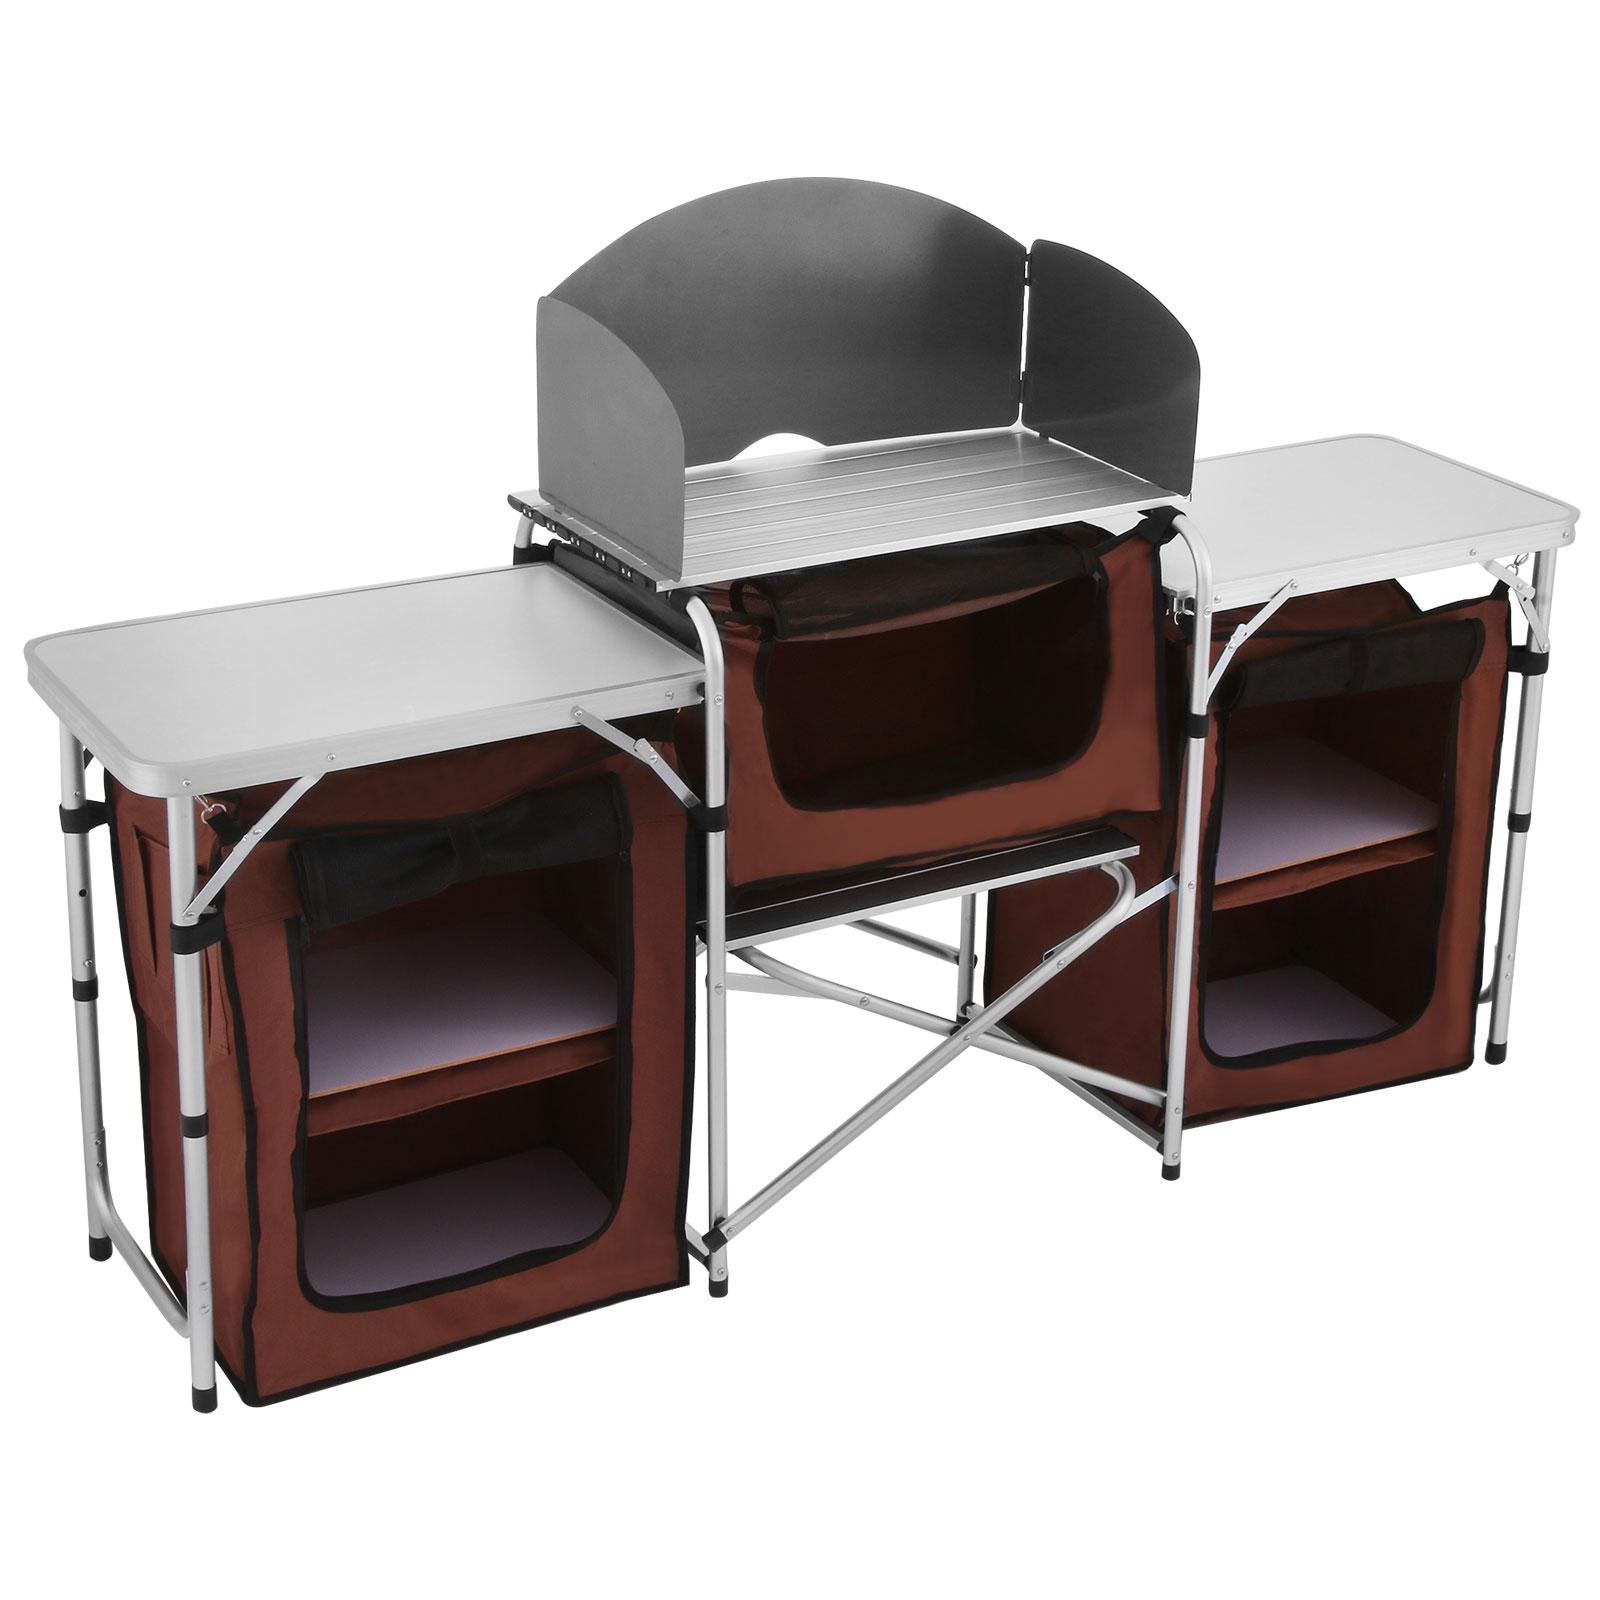 Xxl campingk che faltbar zum outdoor kochen partyk che for Kuchenschrank outdoor